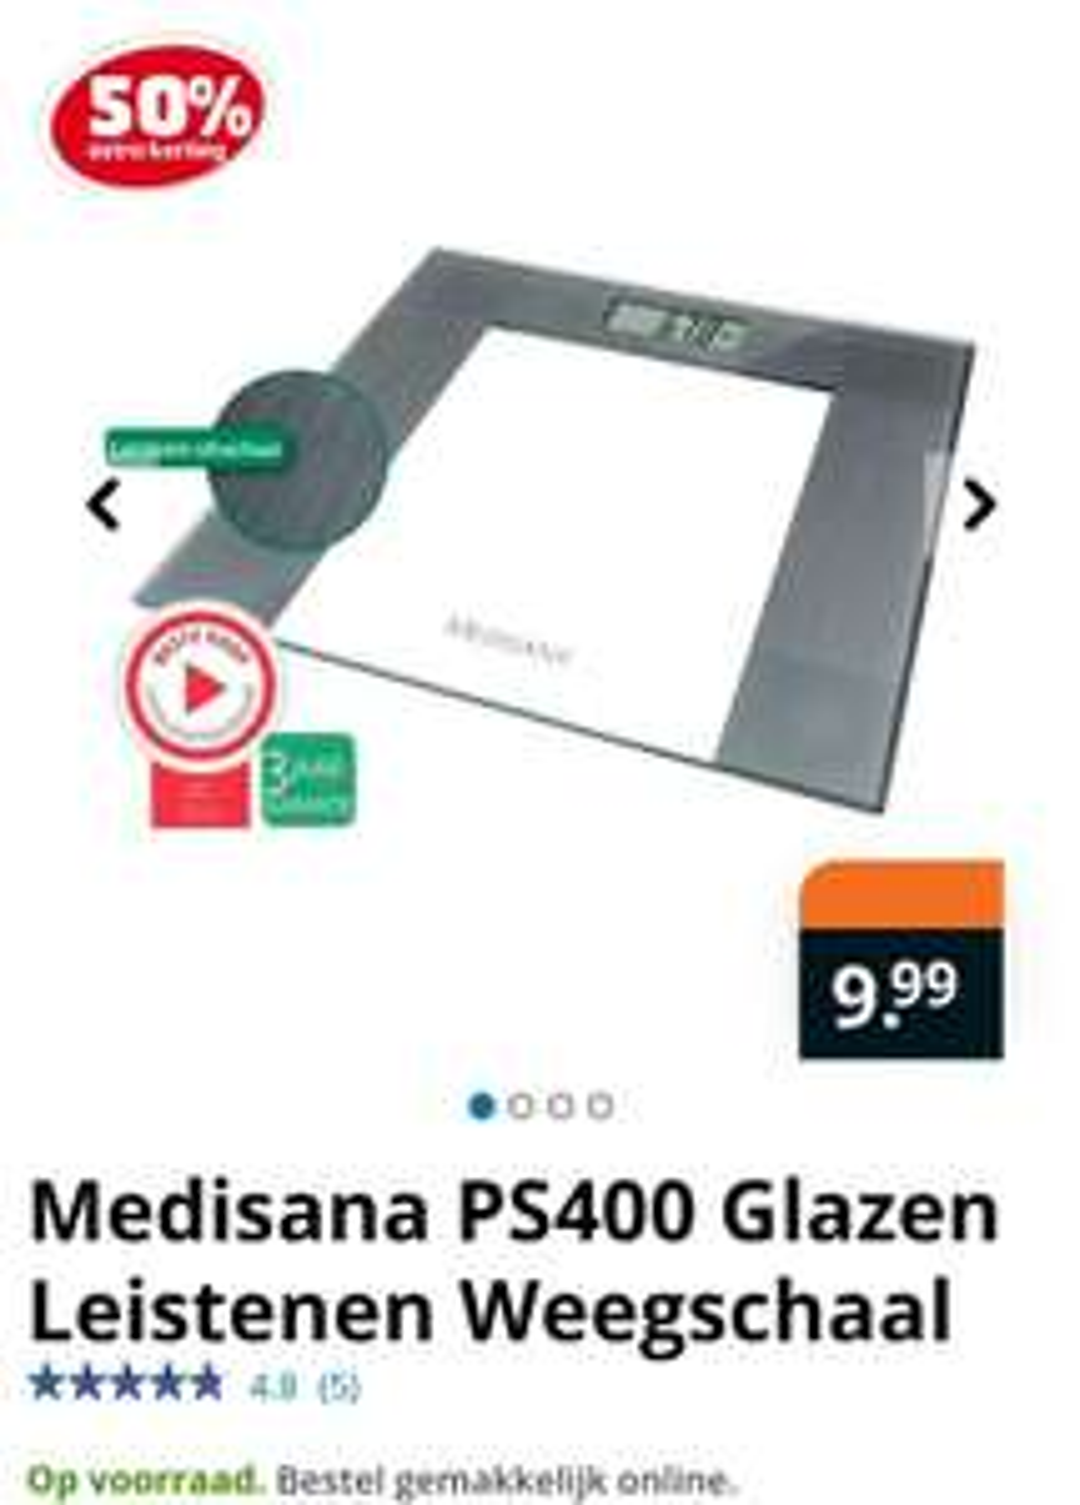 Medisana PS400 Glazen Leistenen Weegschaal nu 4.99